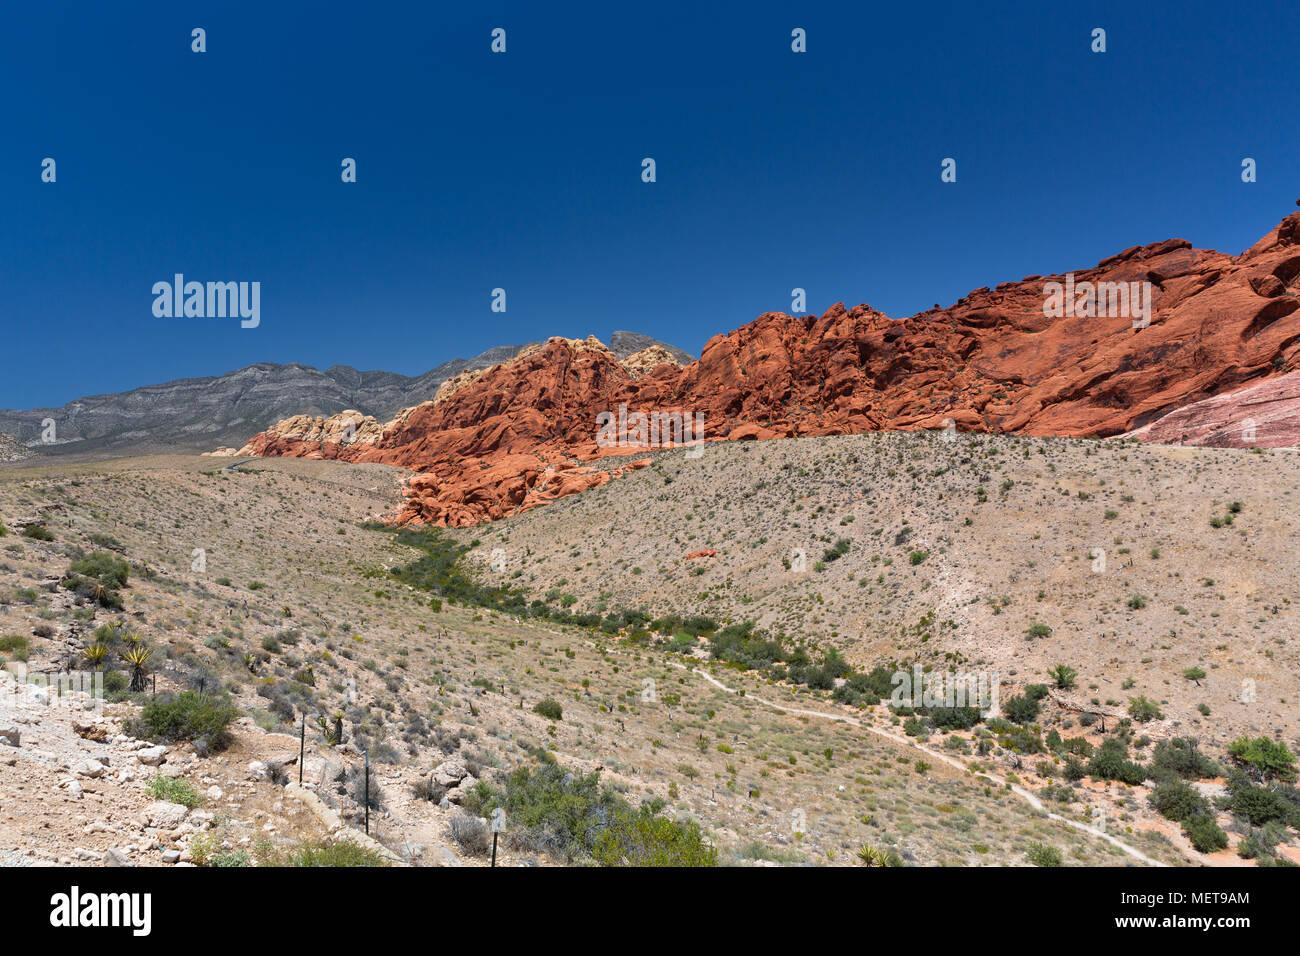 El Red Rock Canyon contra un cielo azul claro - Las Vegas, Nevada Imagen De Stock